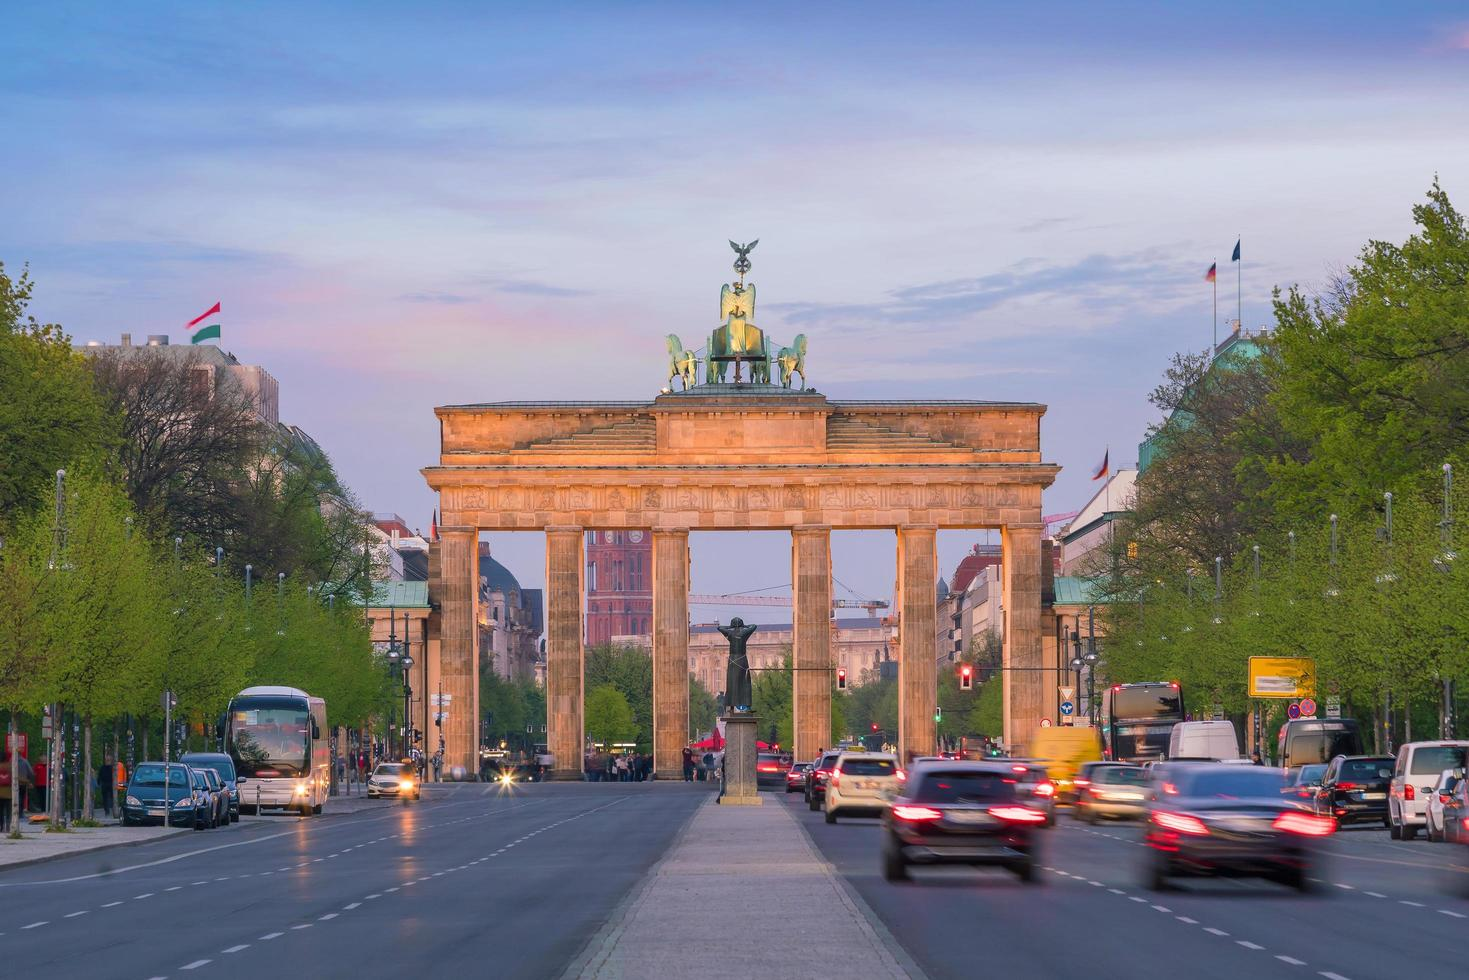 The Brandenburg Gate in Berlin  photo